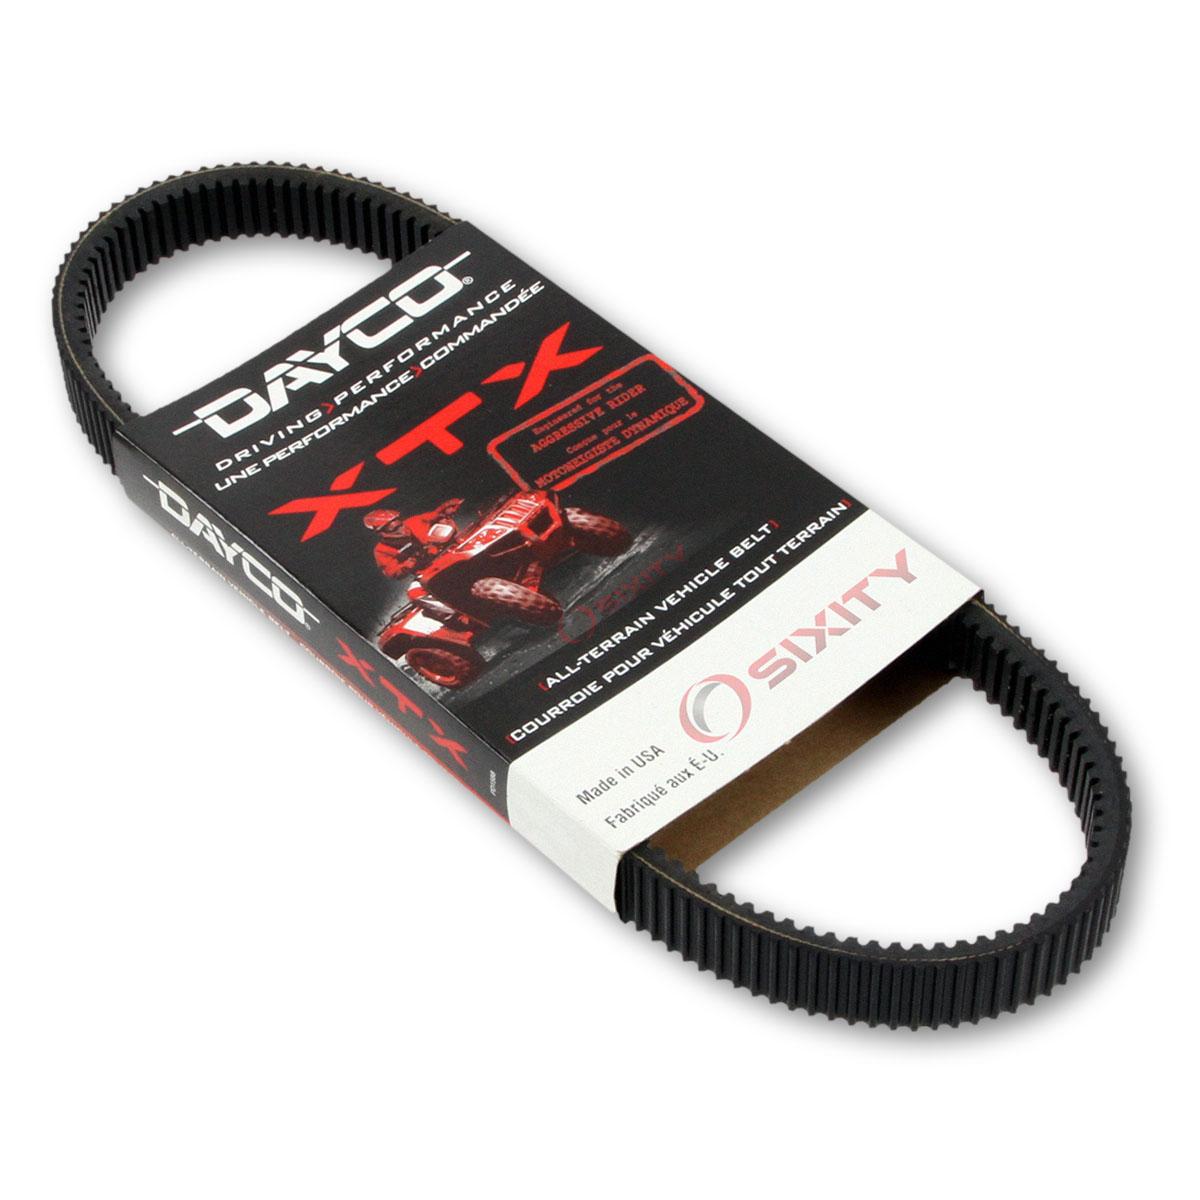 2007-2011 Polaris Sportsman 800 EFI Severe Duty Drive Belt